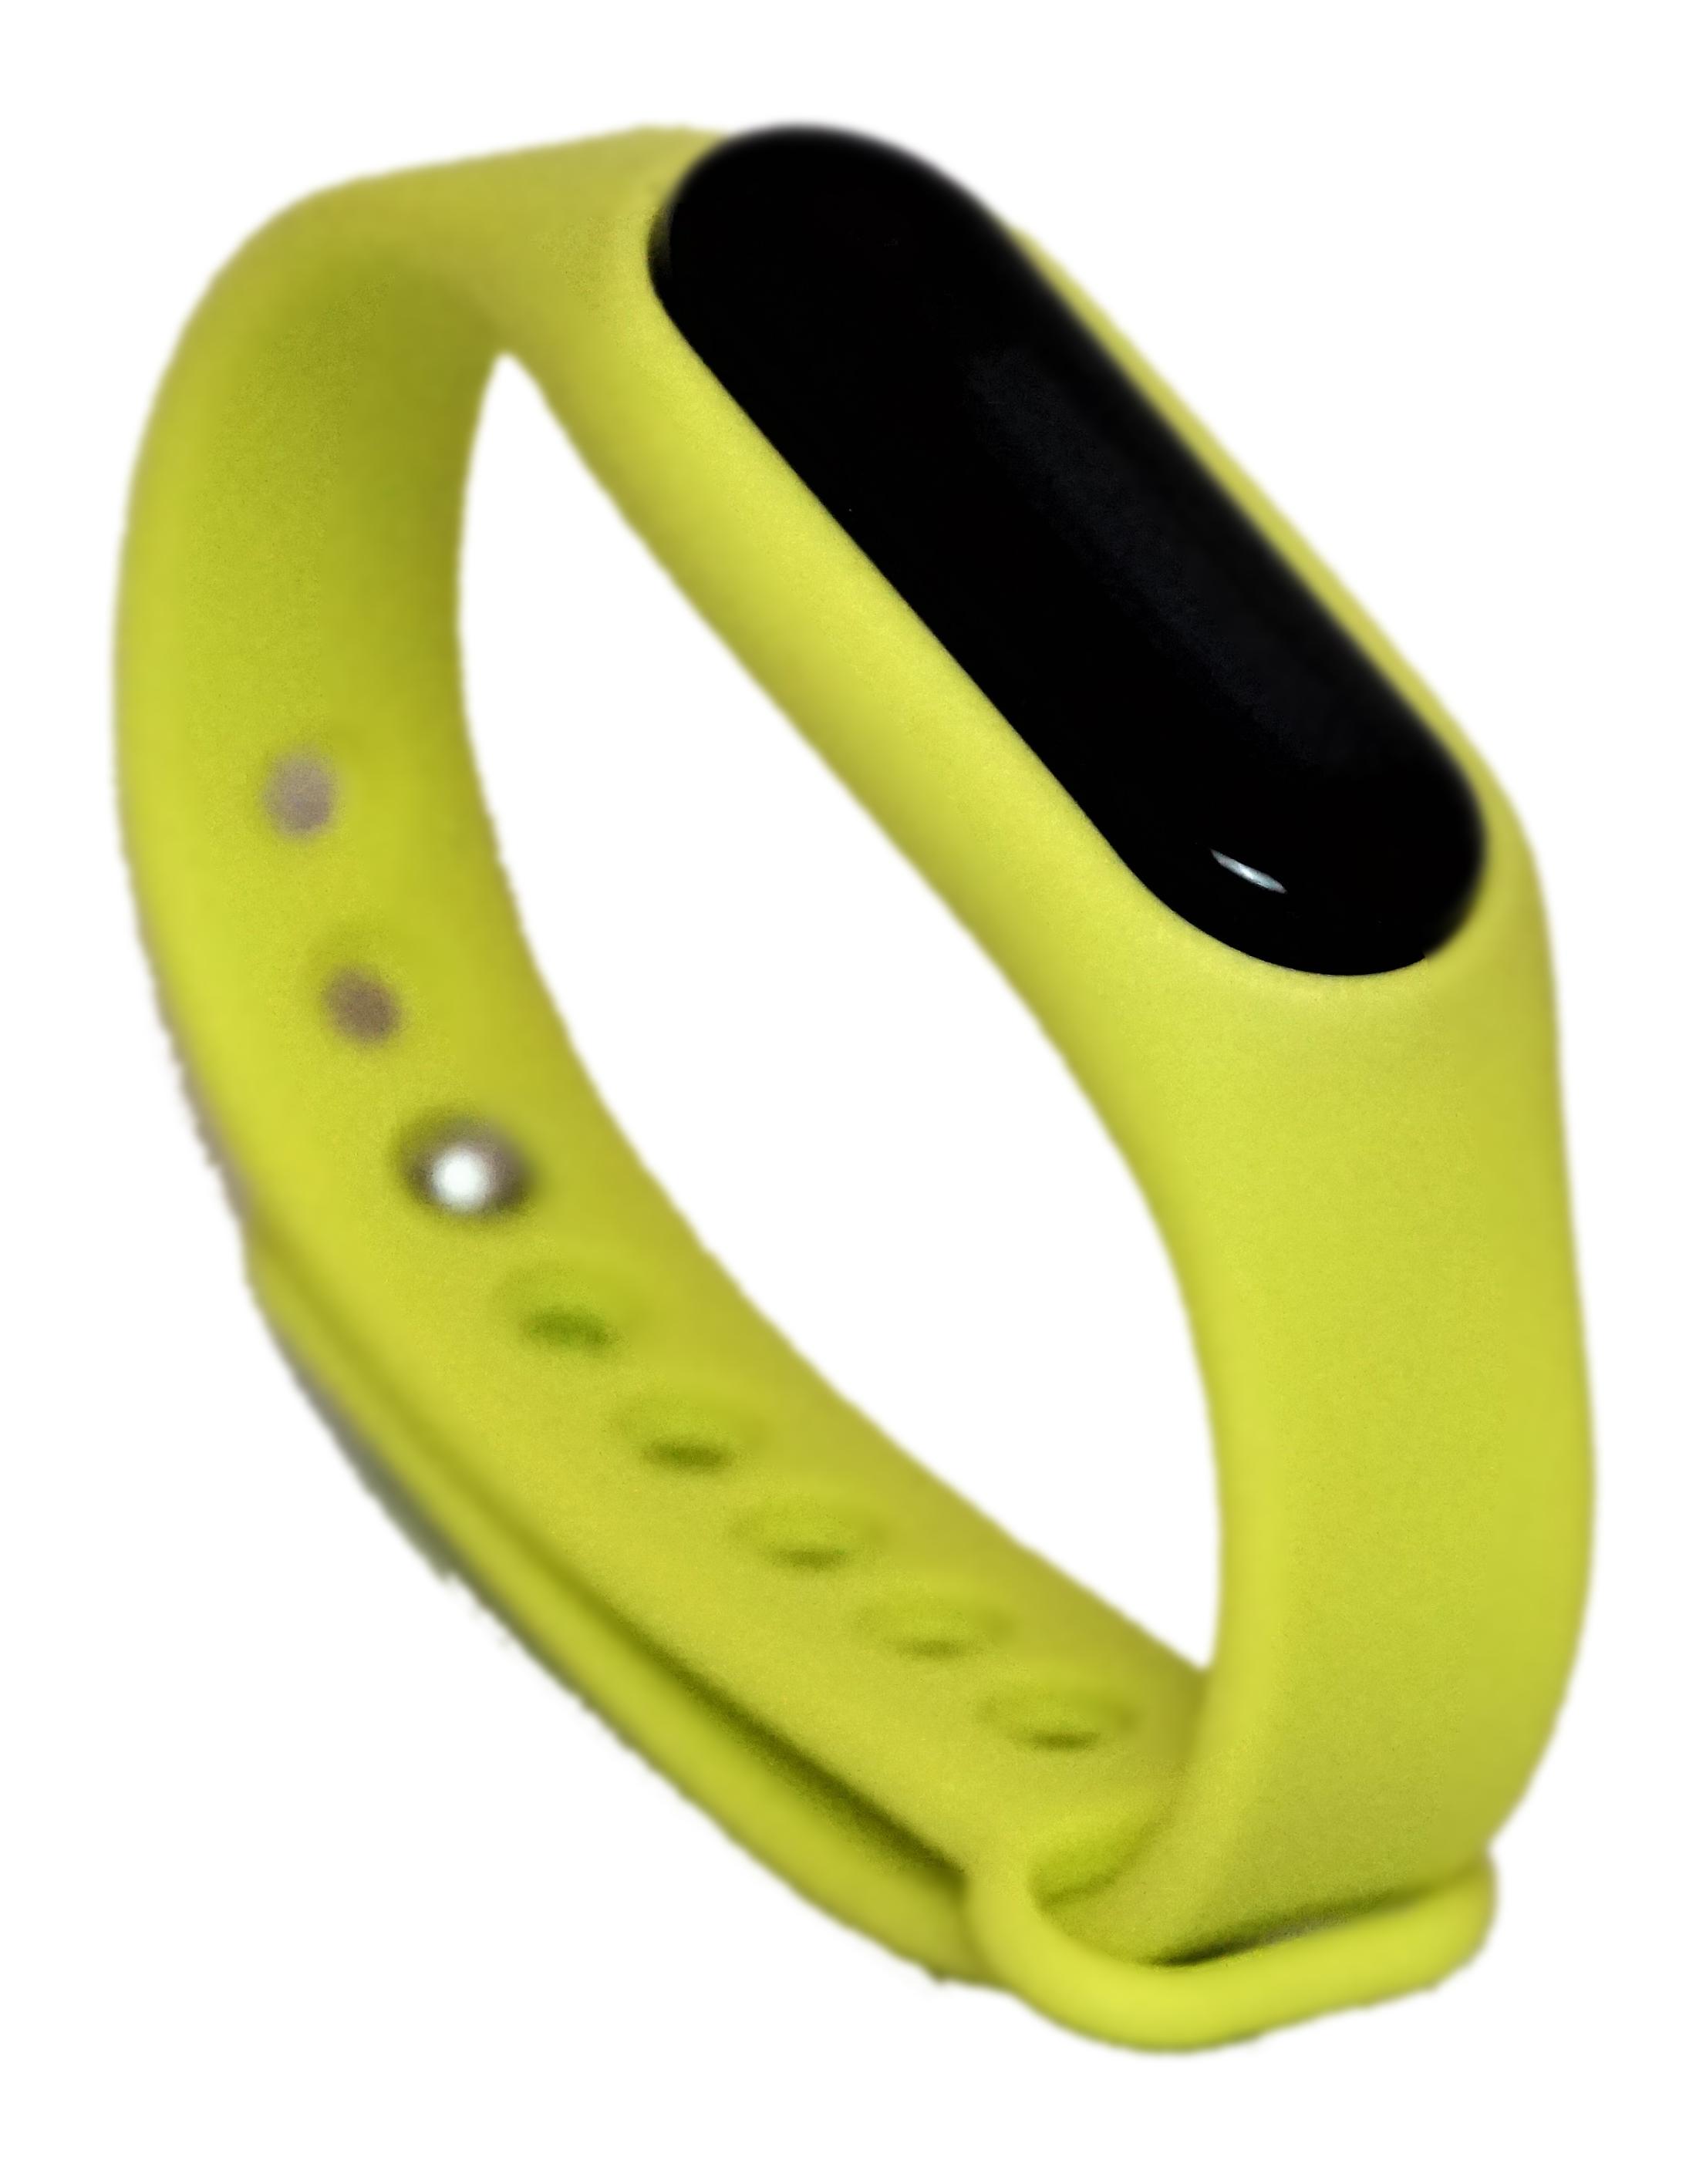 Go-tcha Wristband Green Strap